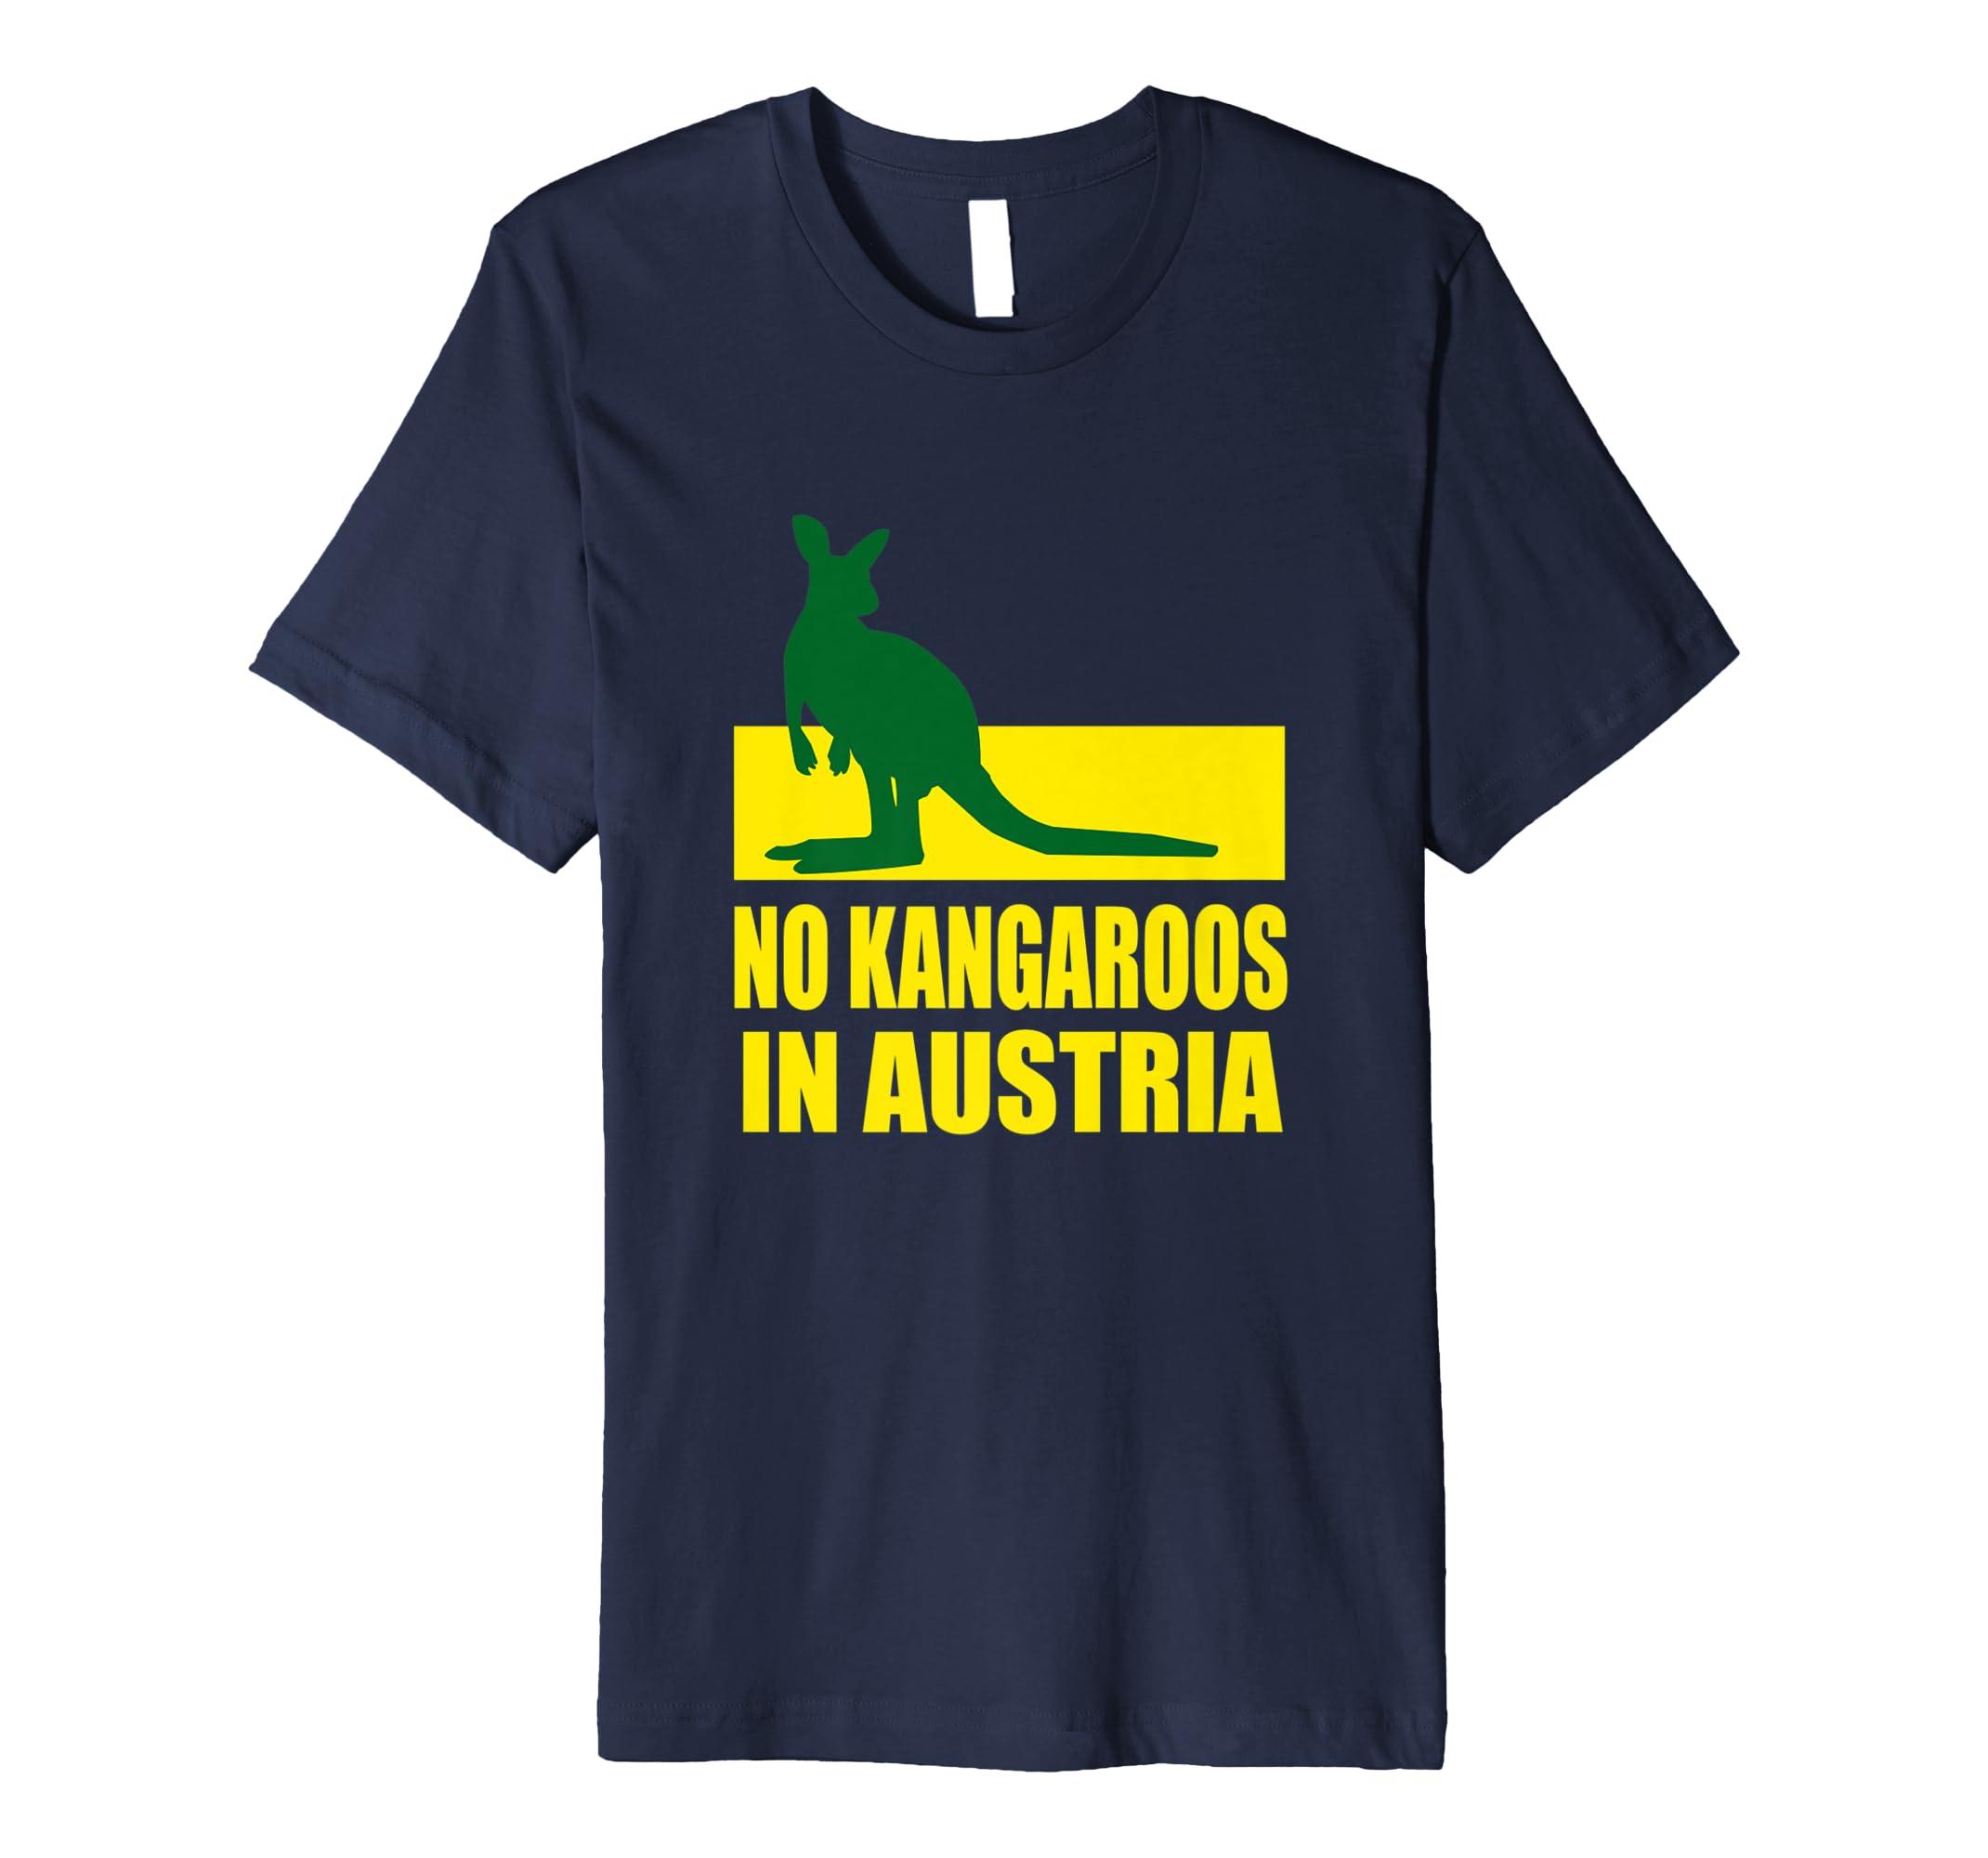 No Kangaroos In Austria T-Shirt - Funny Kangaroo T-Shirt-AZP